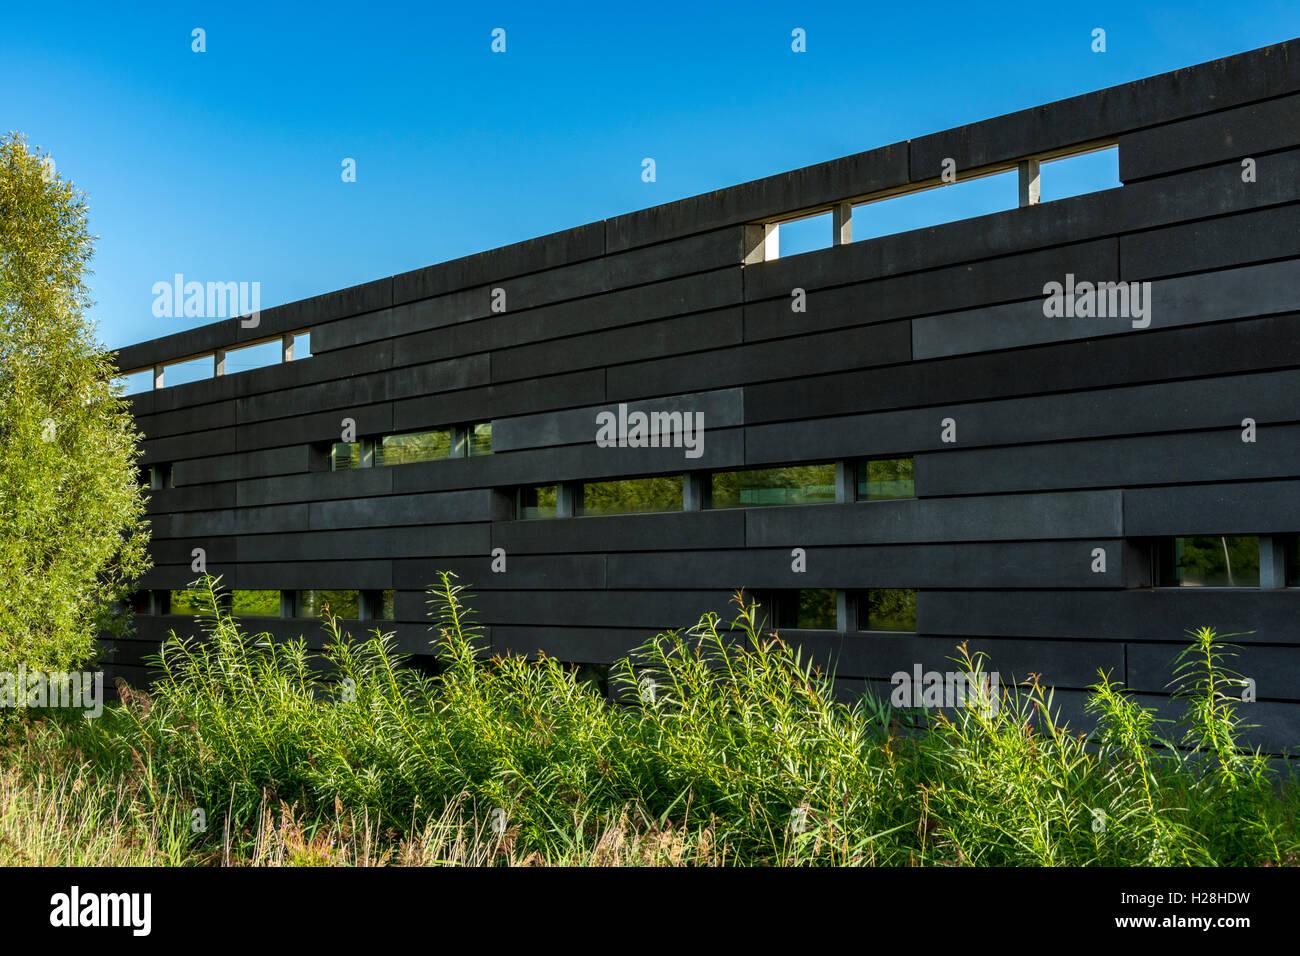 The Experian data centre building, Mere Way, Ruddington Fields Business Park, Ruddington, Nottingham, England, UK Stock Photo